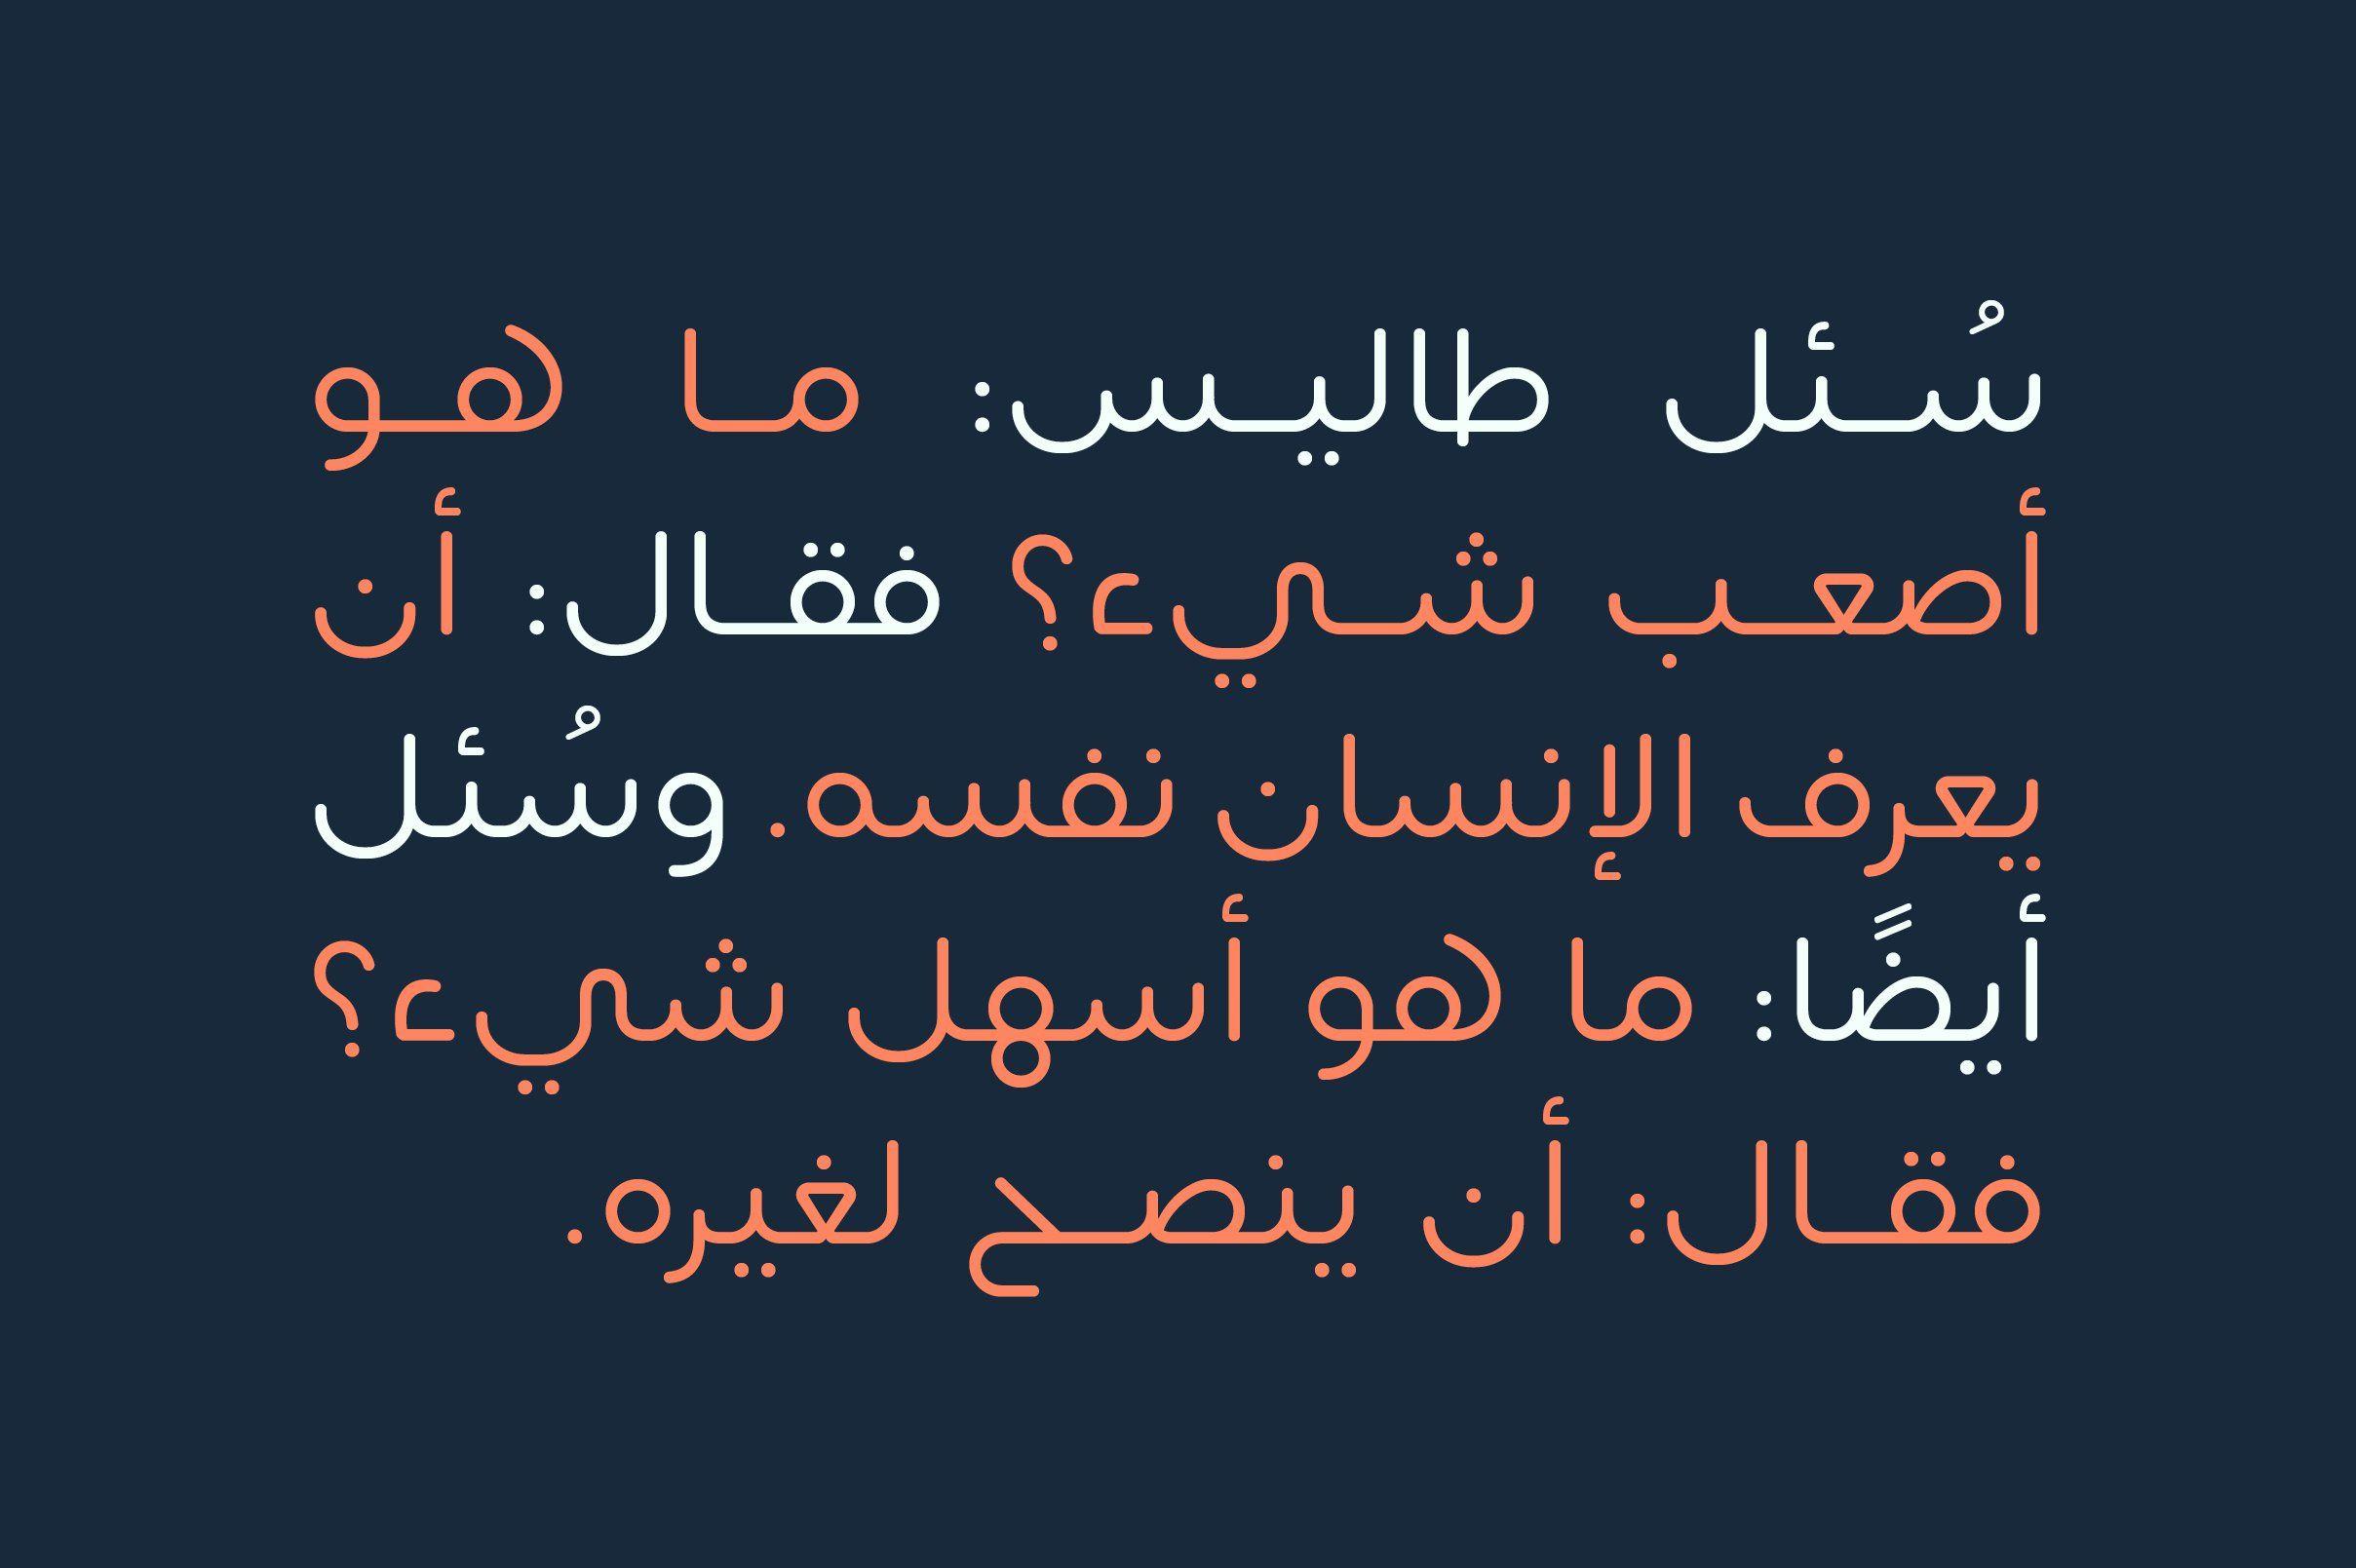 Lafeef Arabic Typeface Arabic Font Typeface Western Font